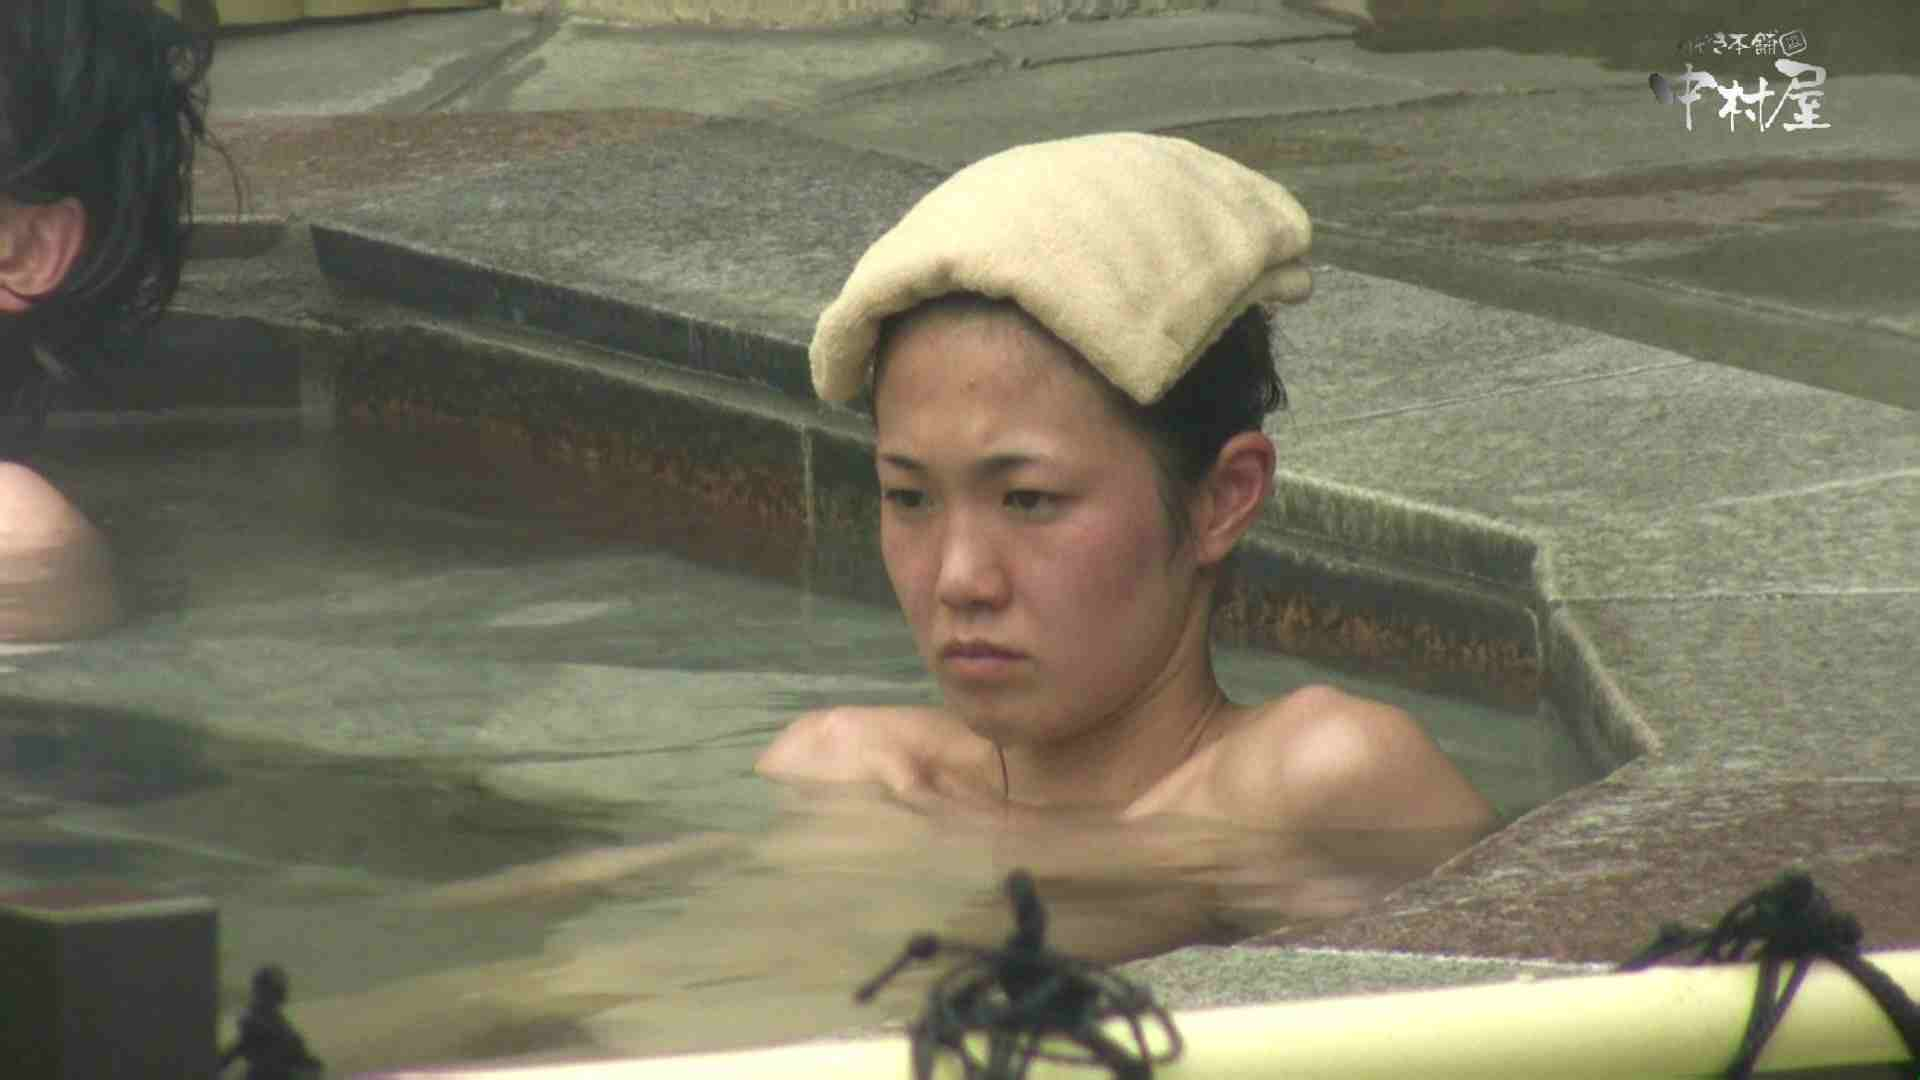 Aquaな露天風呂Vol.889 0   0  87連発 79